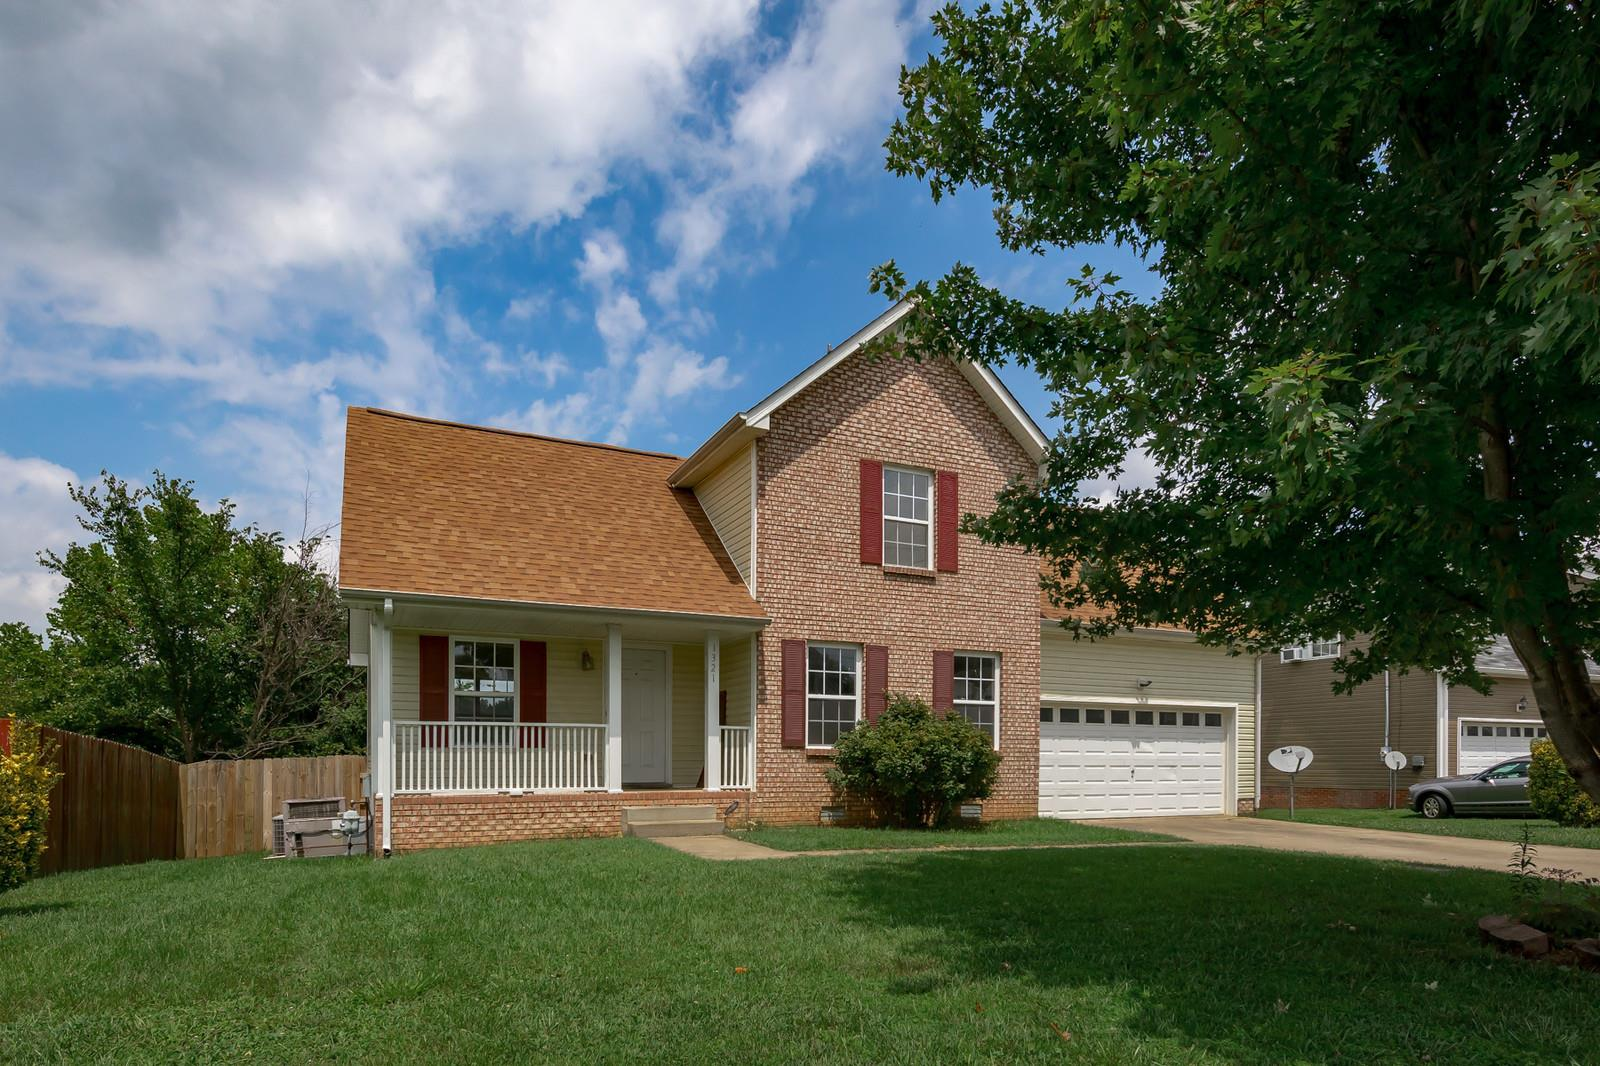 1321 Sunfield Dr, Clarksville, TN 37042 - Clarksville, TN real estate listing